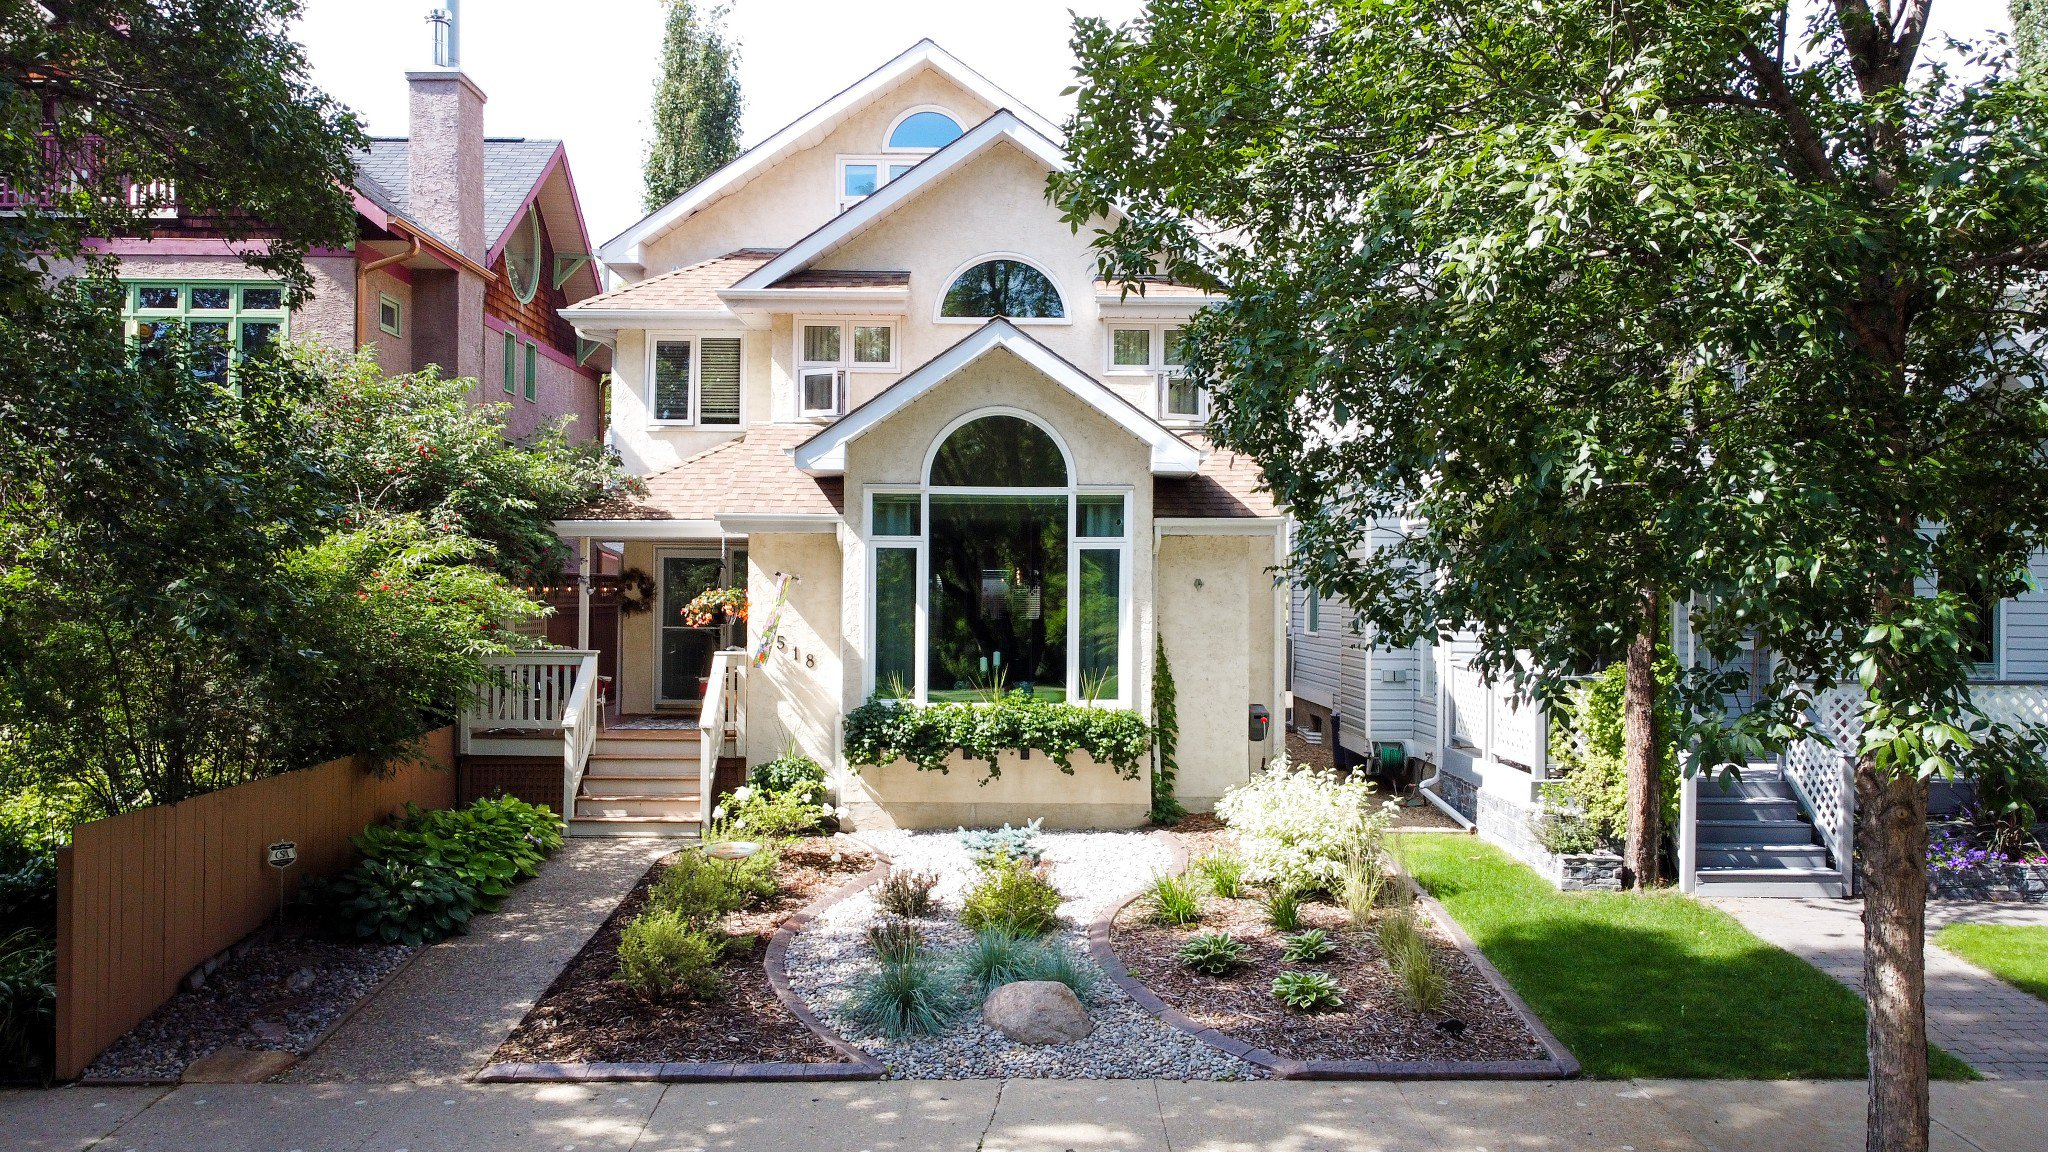 Main Photo: 9518 100 Street in Edmonton: House for sale